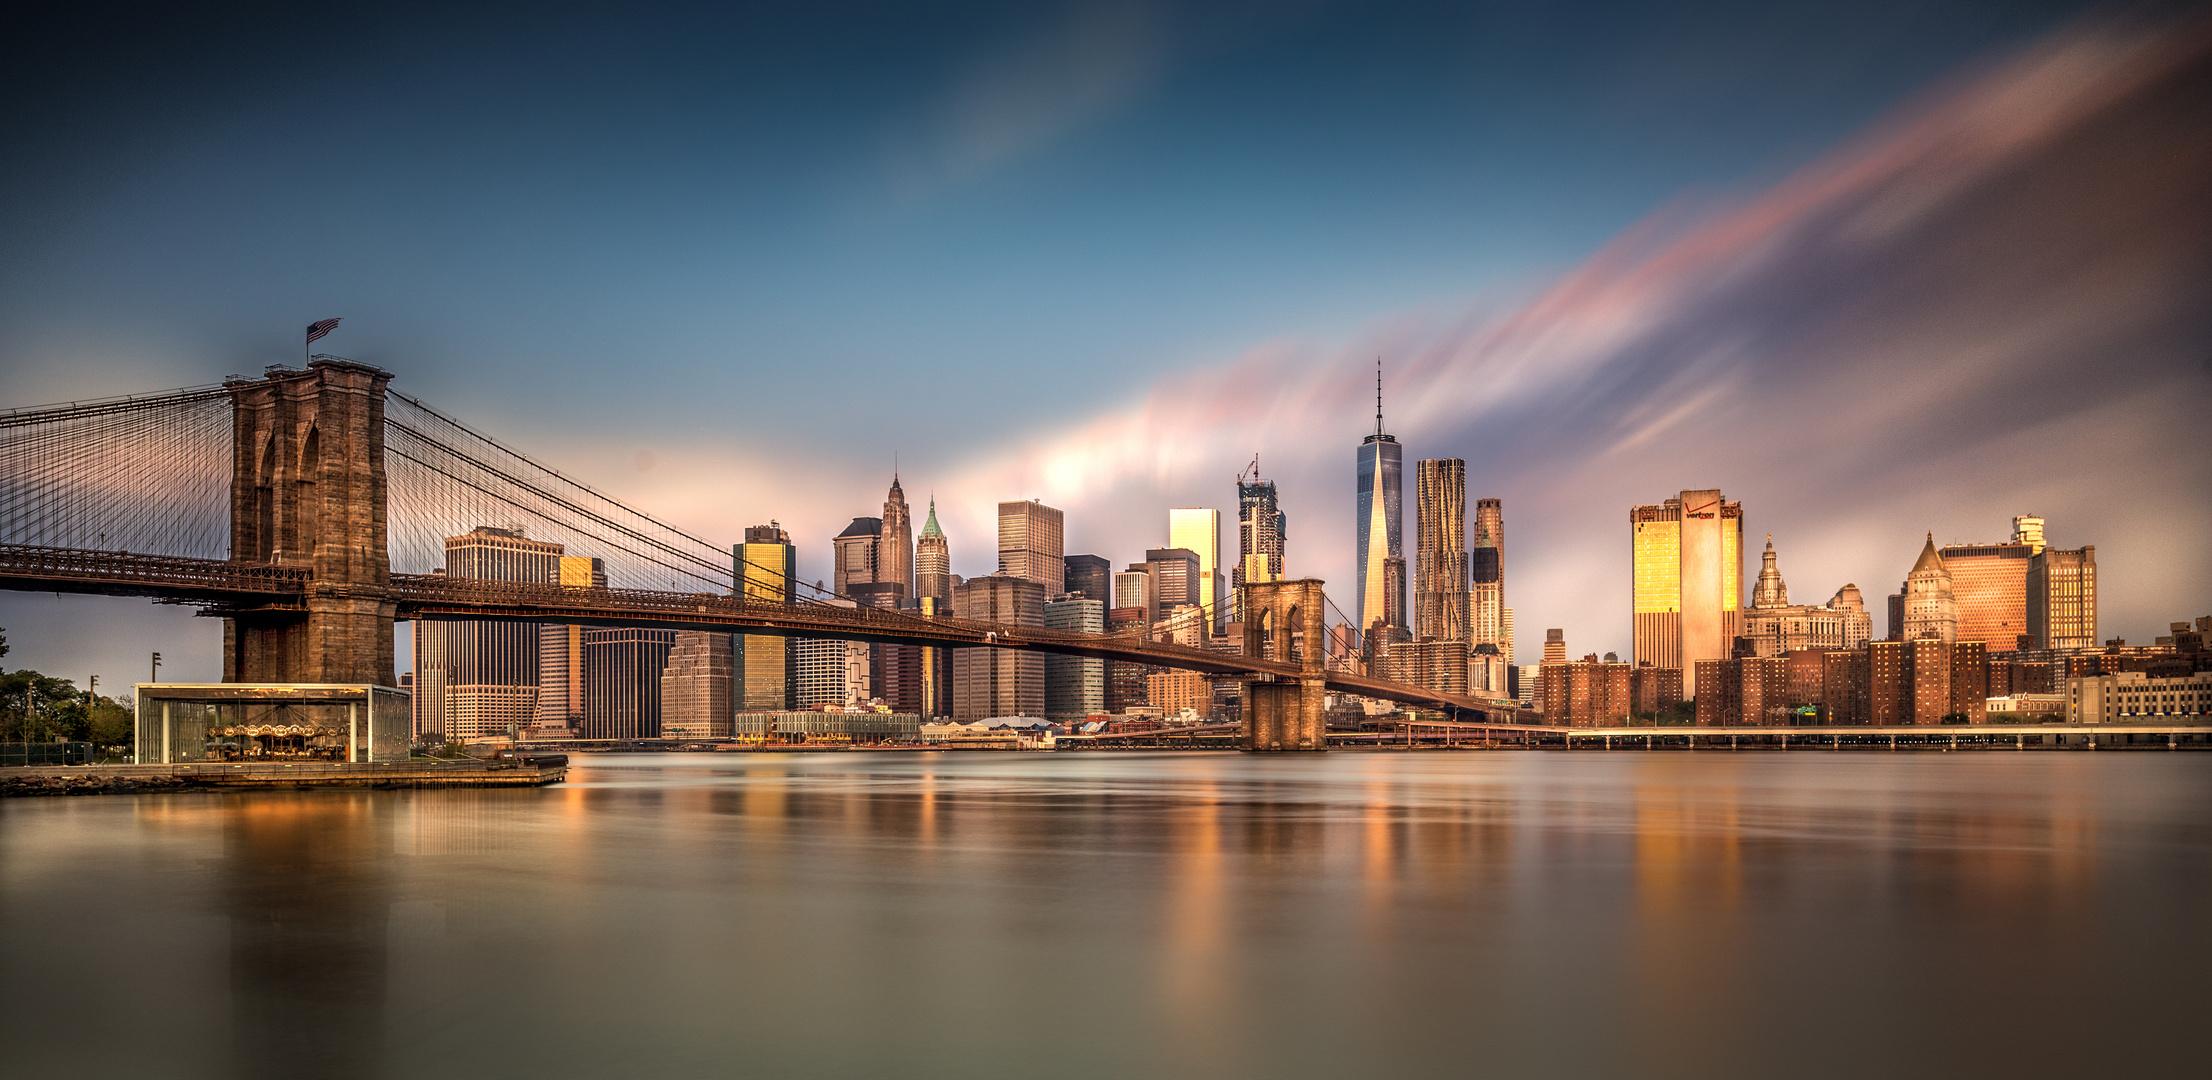 Skyline New York Foto Bild Architektur North America